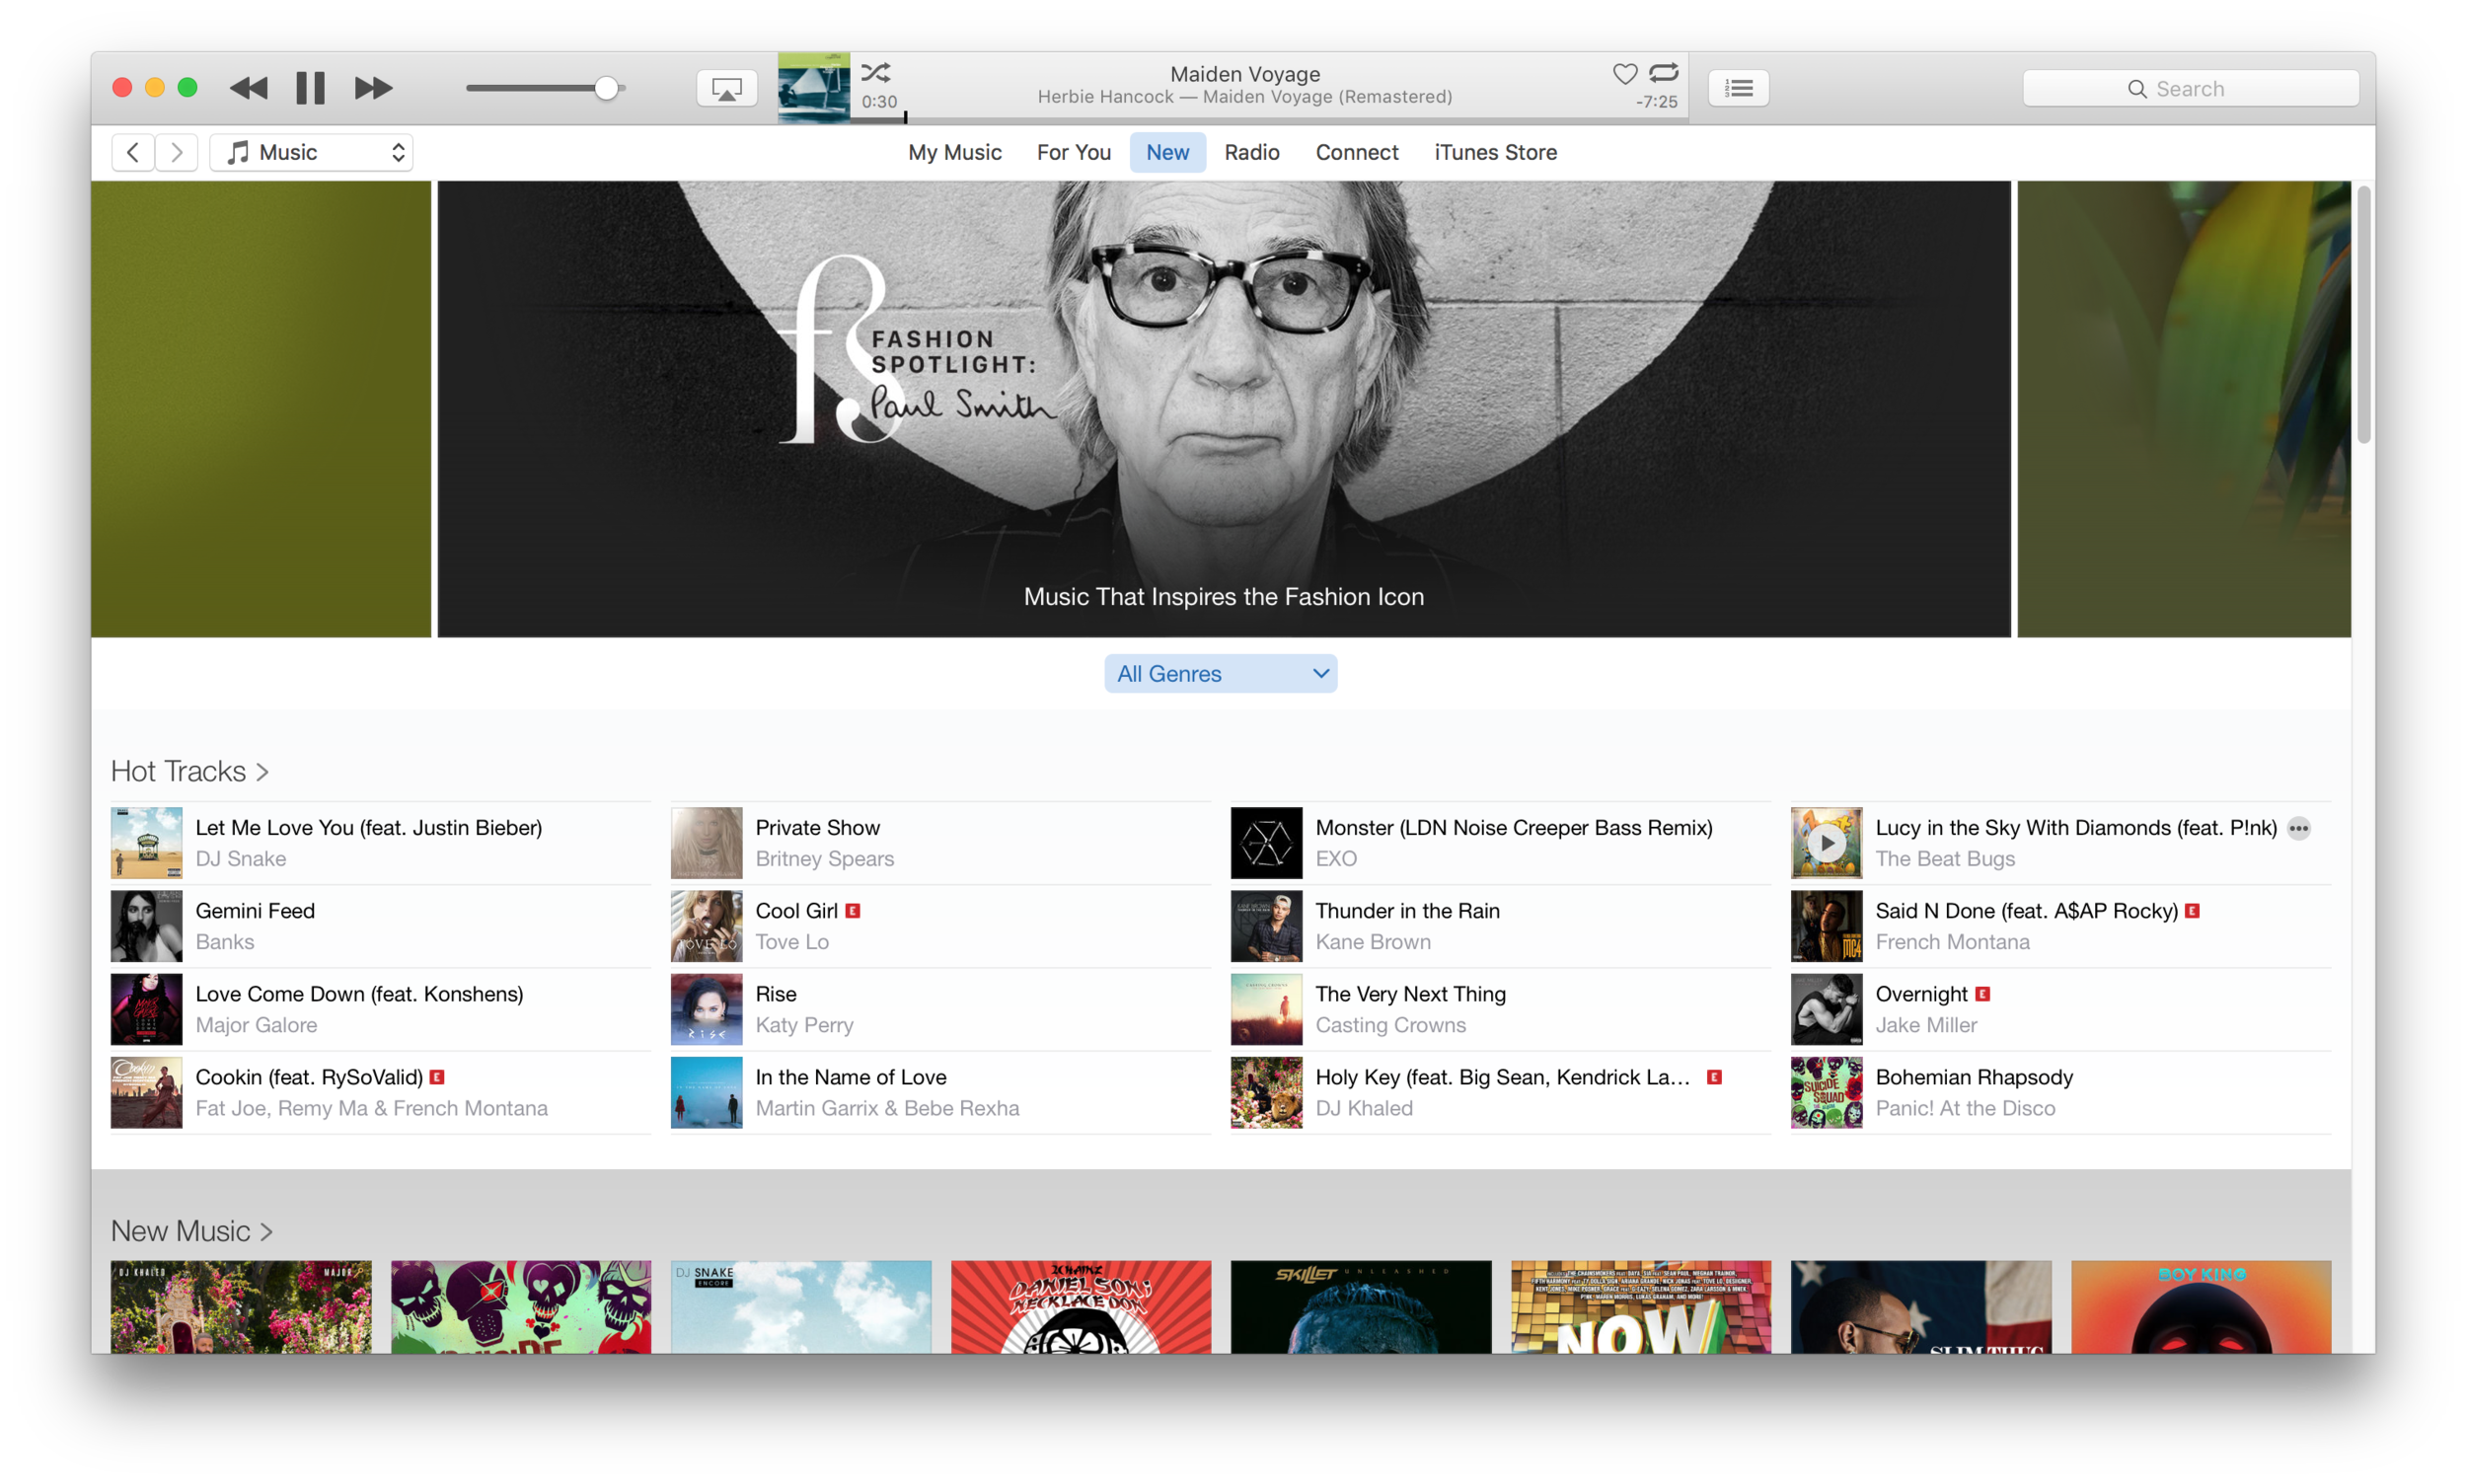 Paul Smith - Store-art on Apple Music